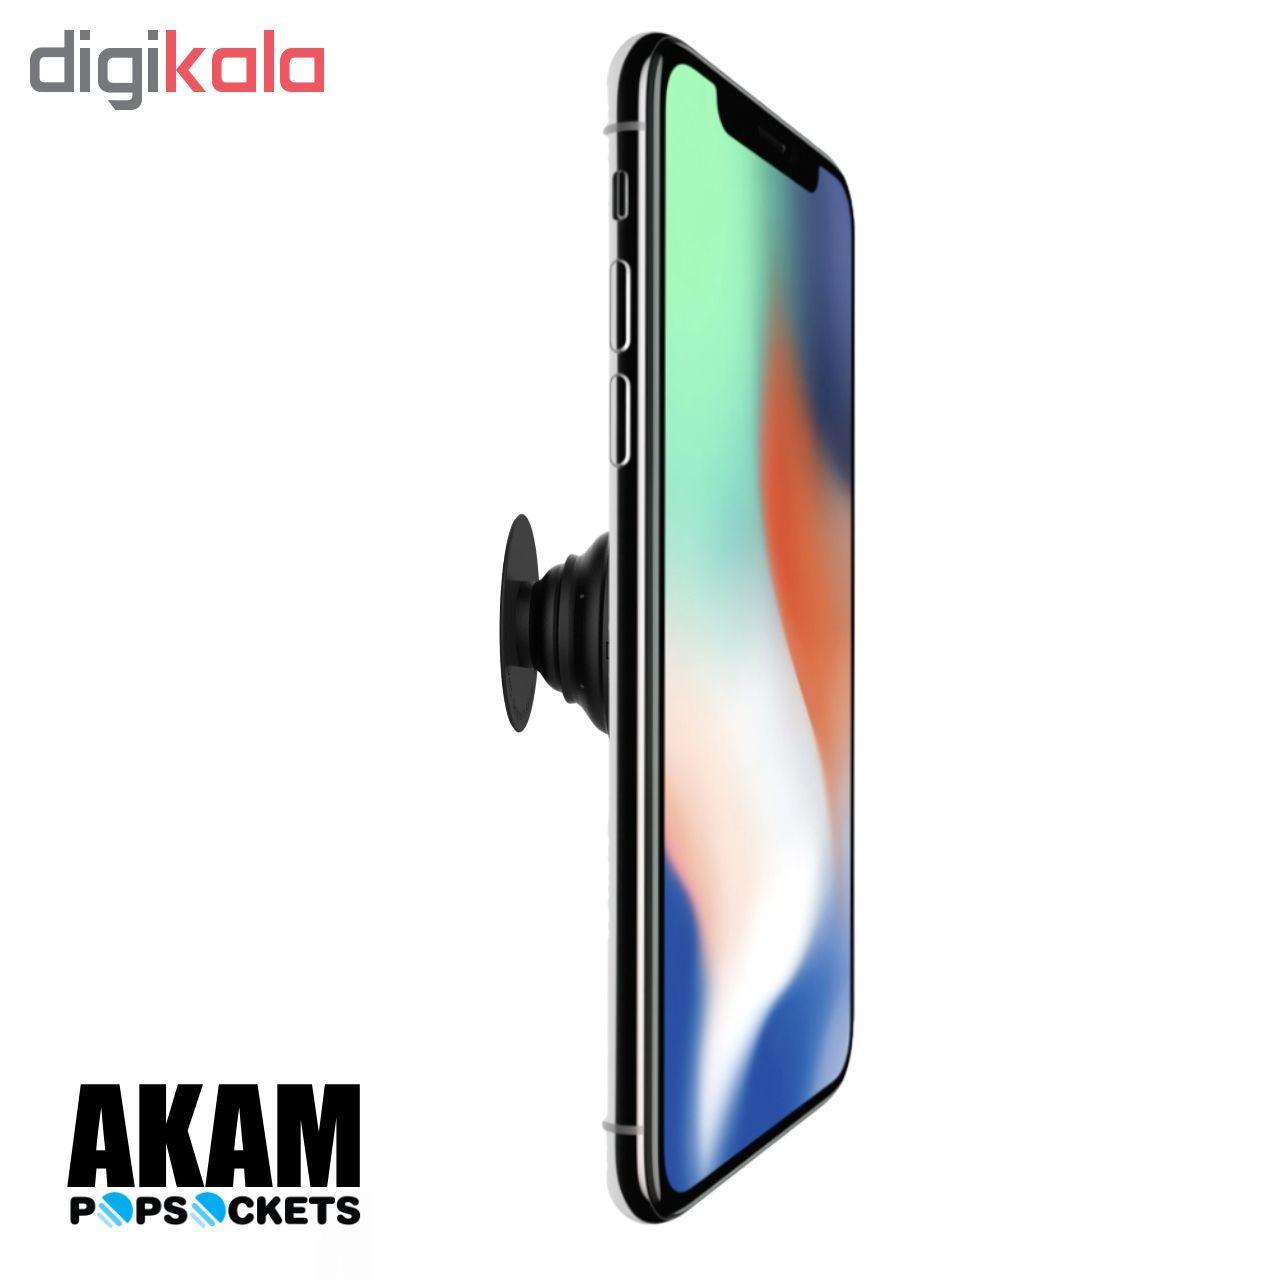 پایه نگهدارنده گوشی موبایل پاپ سوکت آکام مدل APS0211 main 1 10